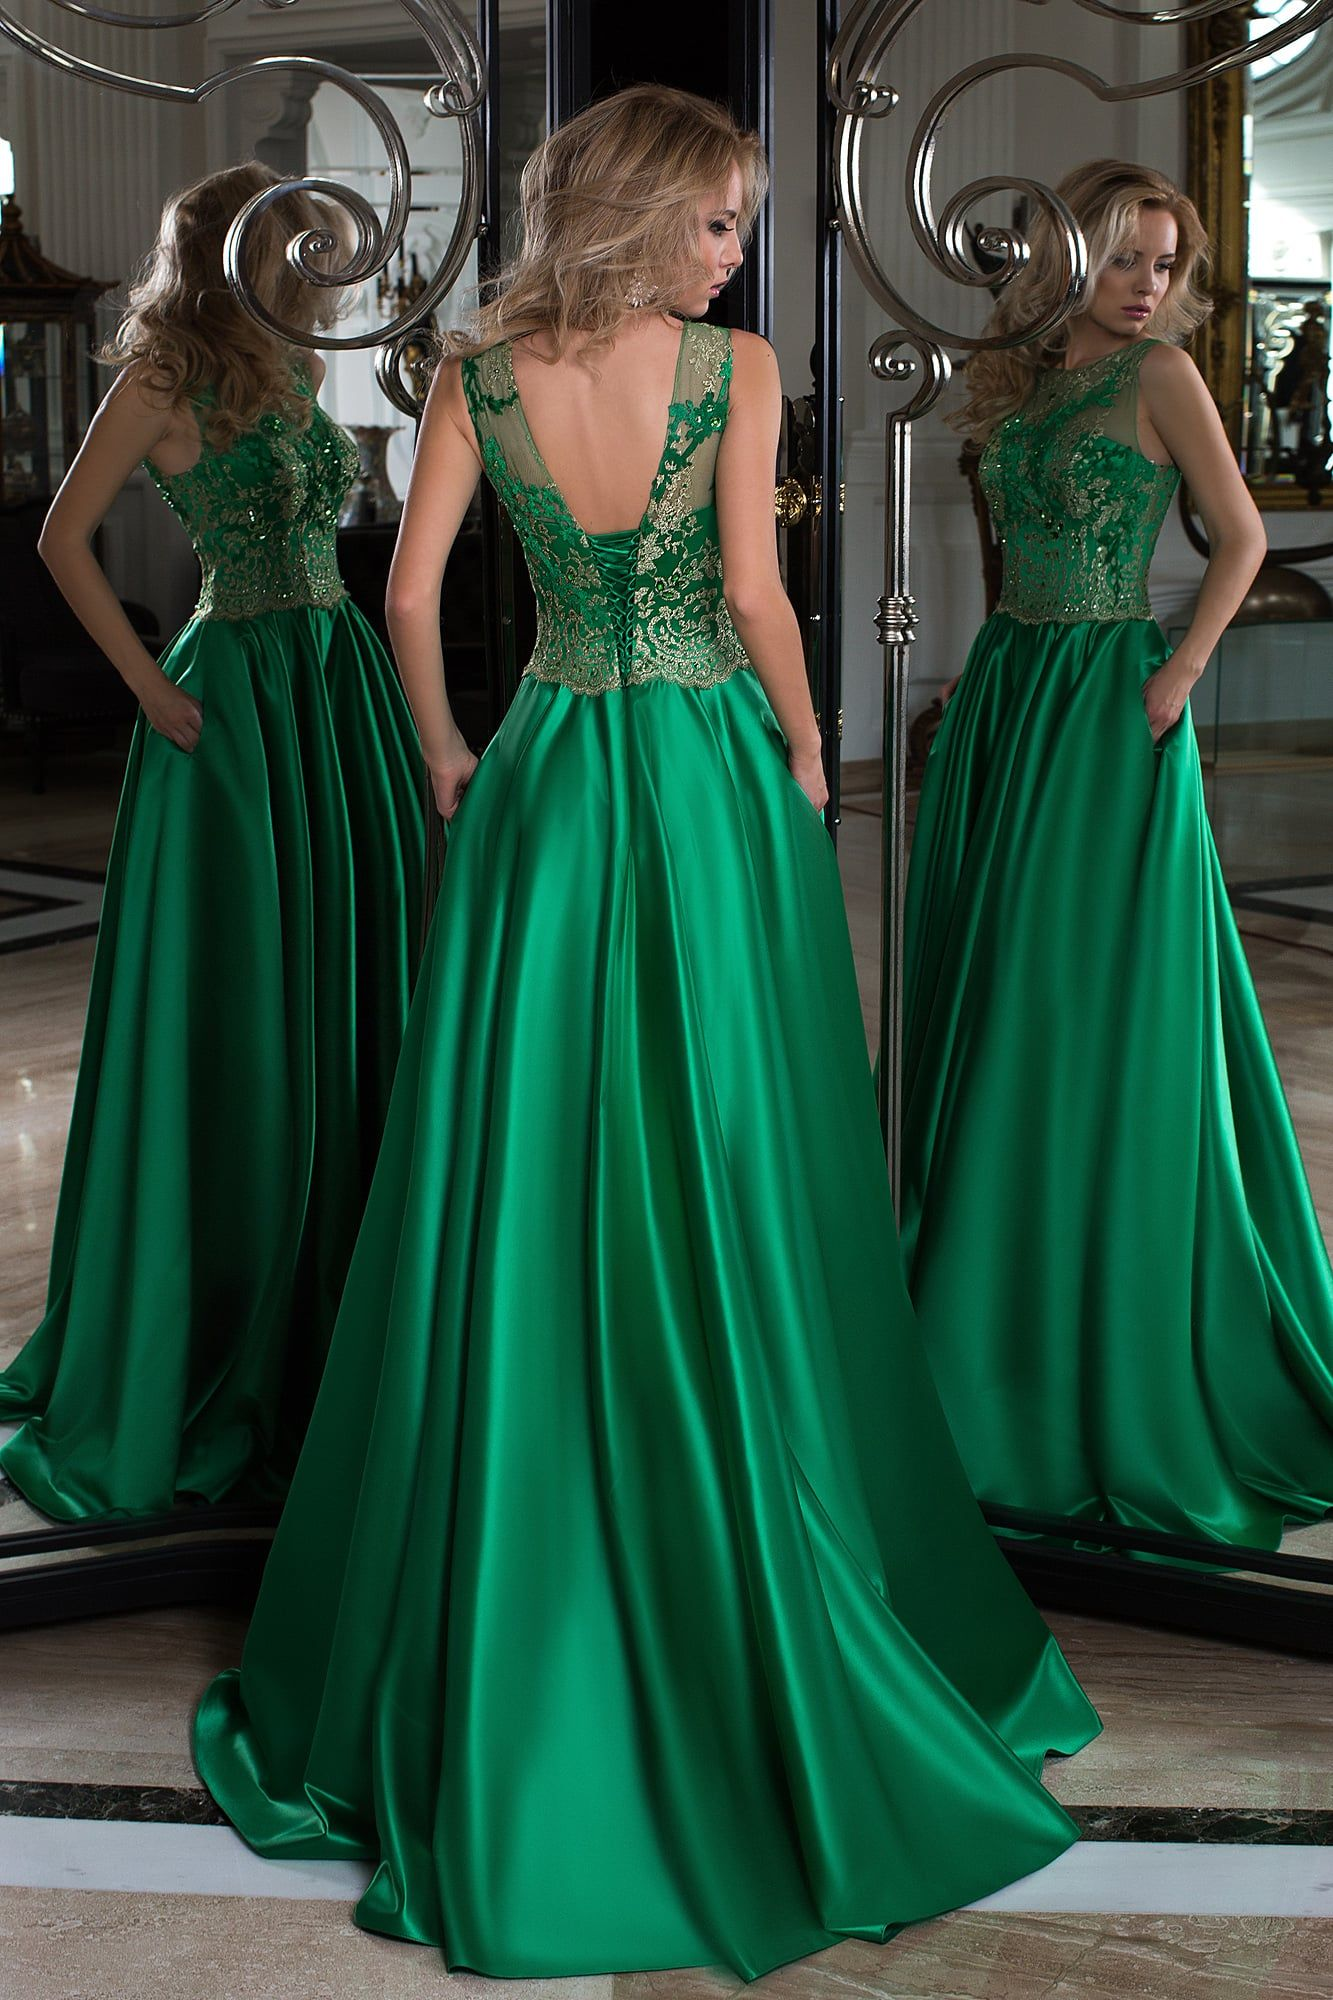 5ed166c4302ee Evening dress Oksana Mukha 16-1010-1 ▷ Wedding Shopping Center Vega in  Moscow